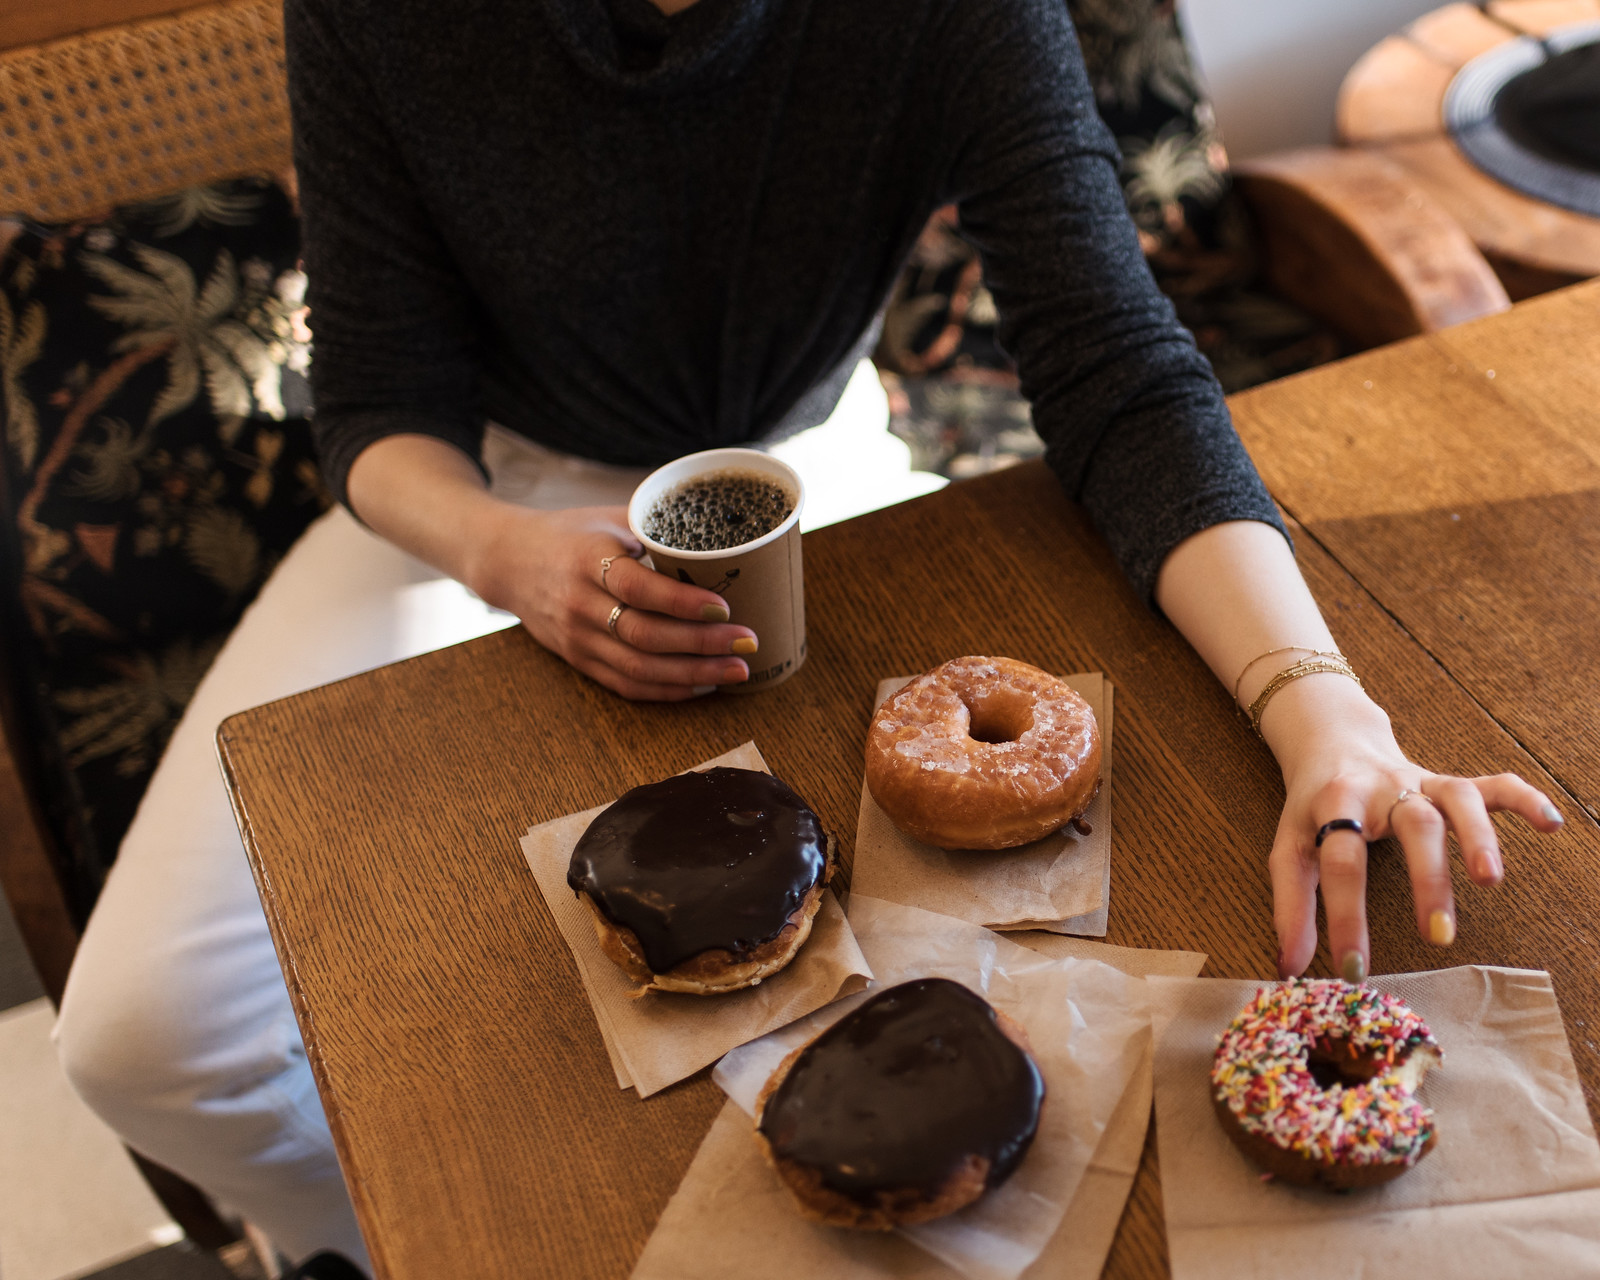 Original Bakery in West Seattle on juliettelaura.blogspot.com